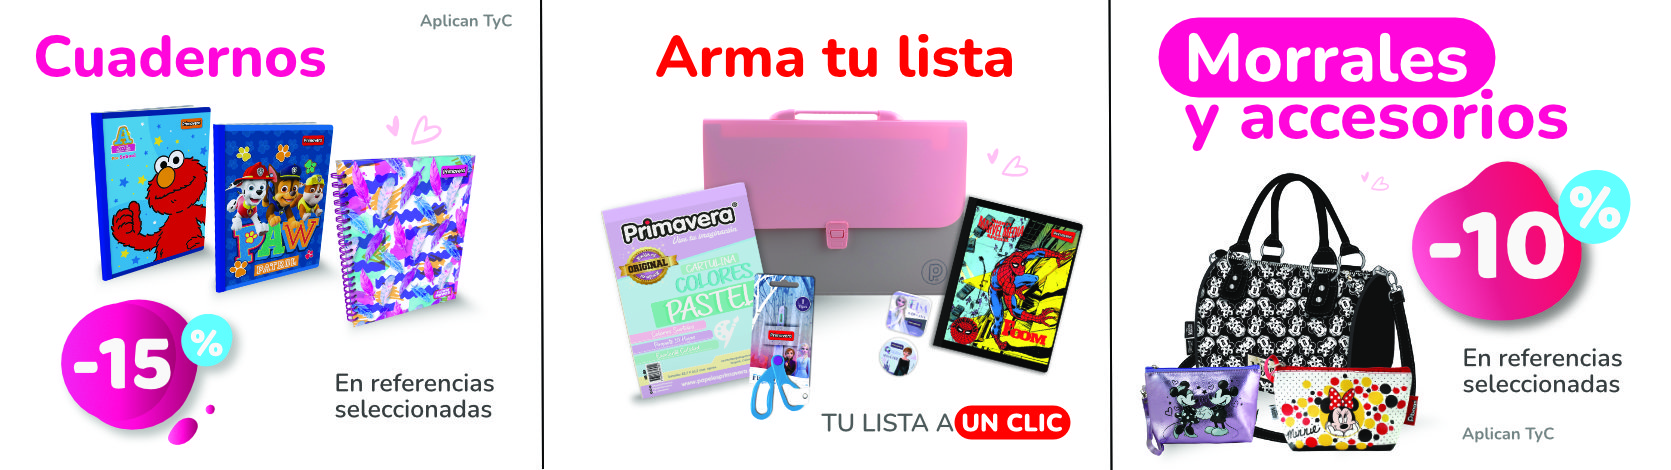 Banner Izquierdo Inferior - Cuadernos